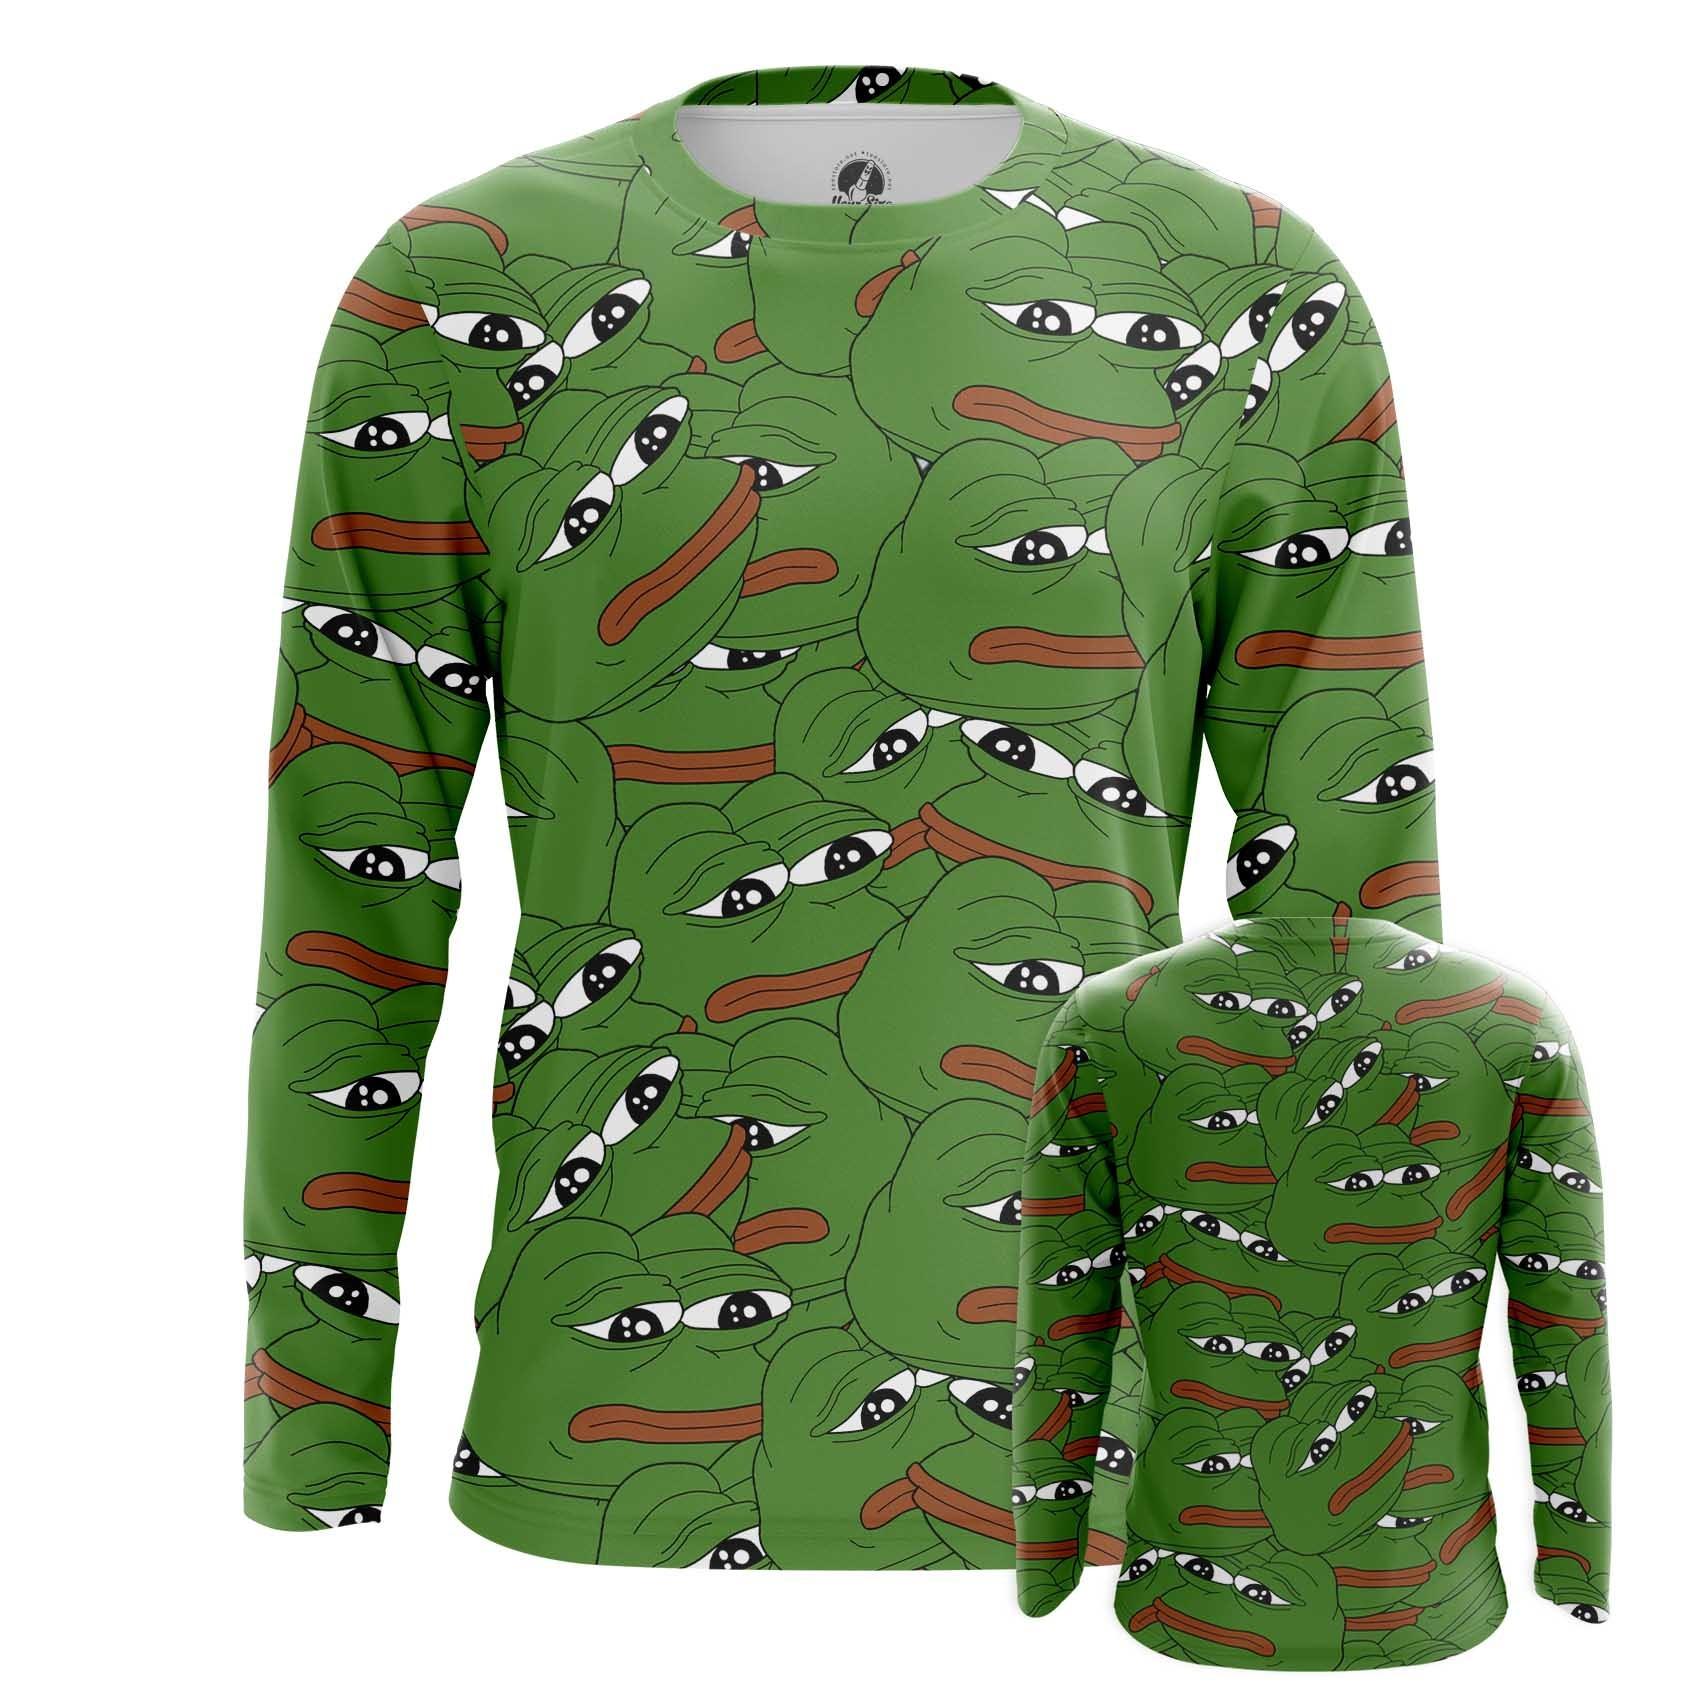 Merchandise Men'S Long Sleeve Pepe Frog Meme